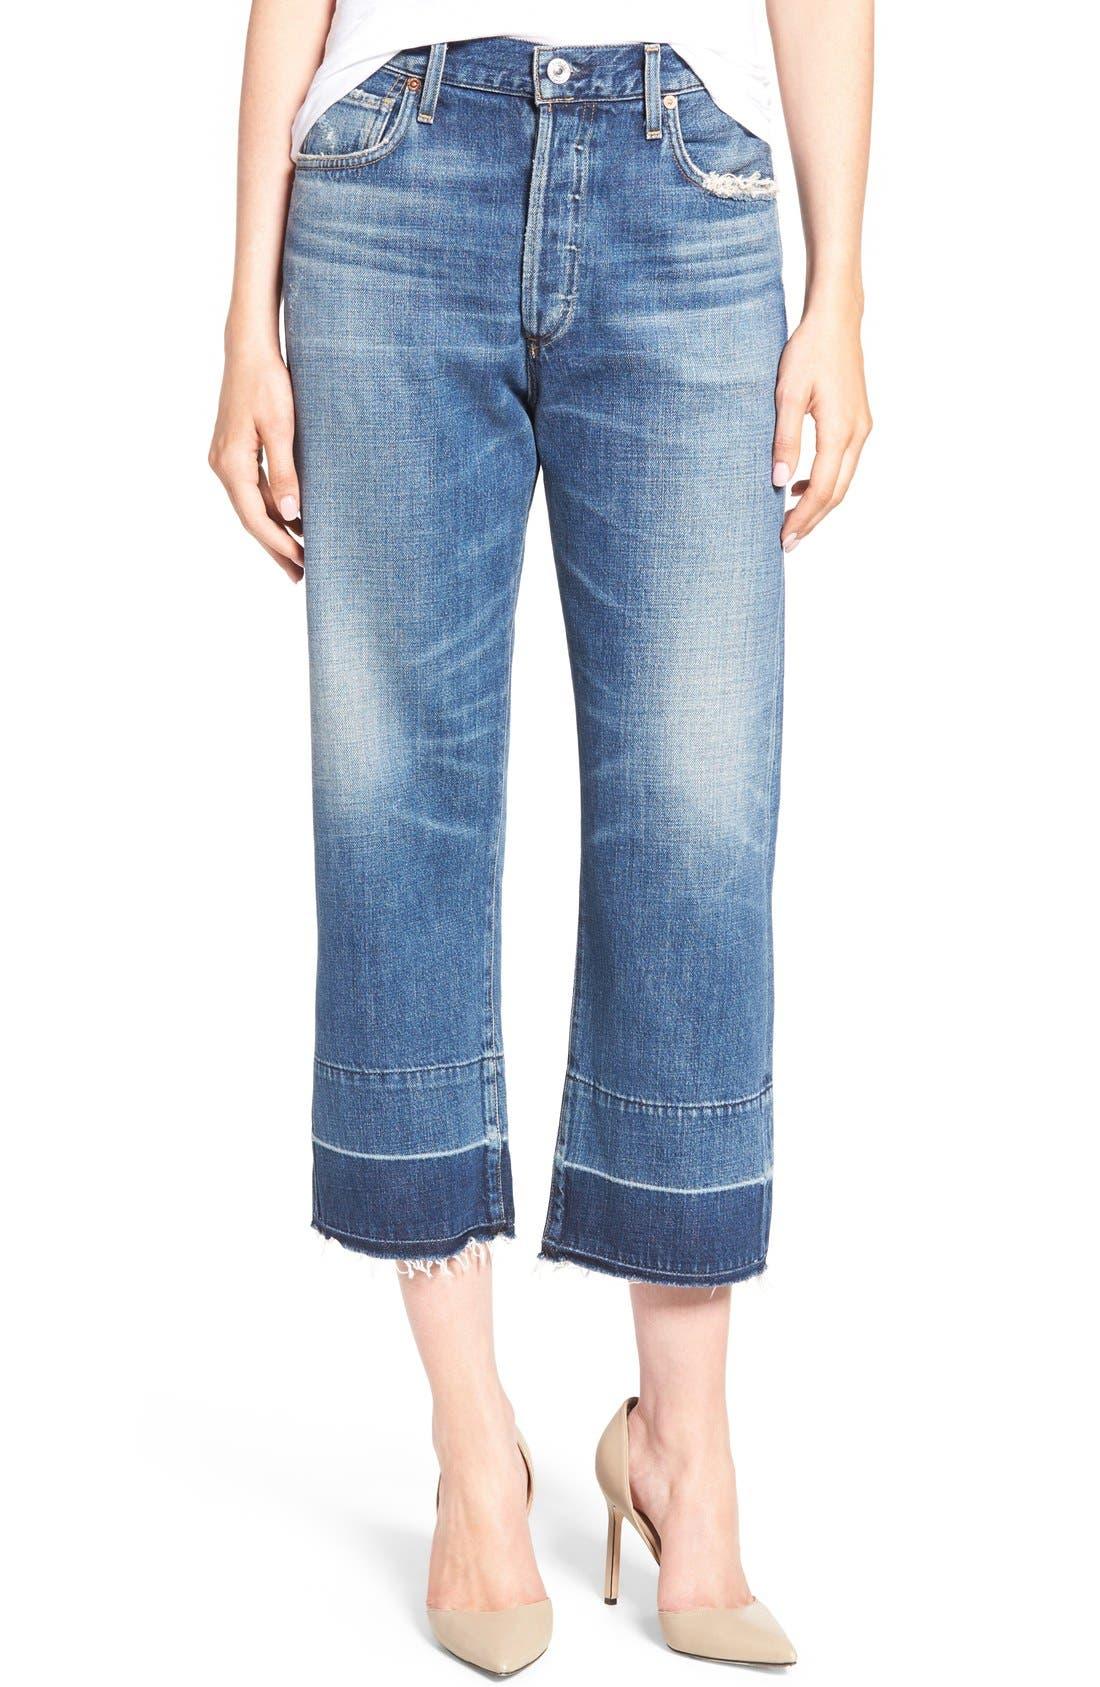 Cora High Waist Released Hem Boyfriend Jeans,                         Main,                         color, Fade Out